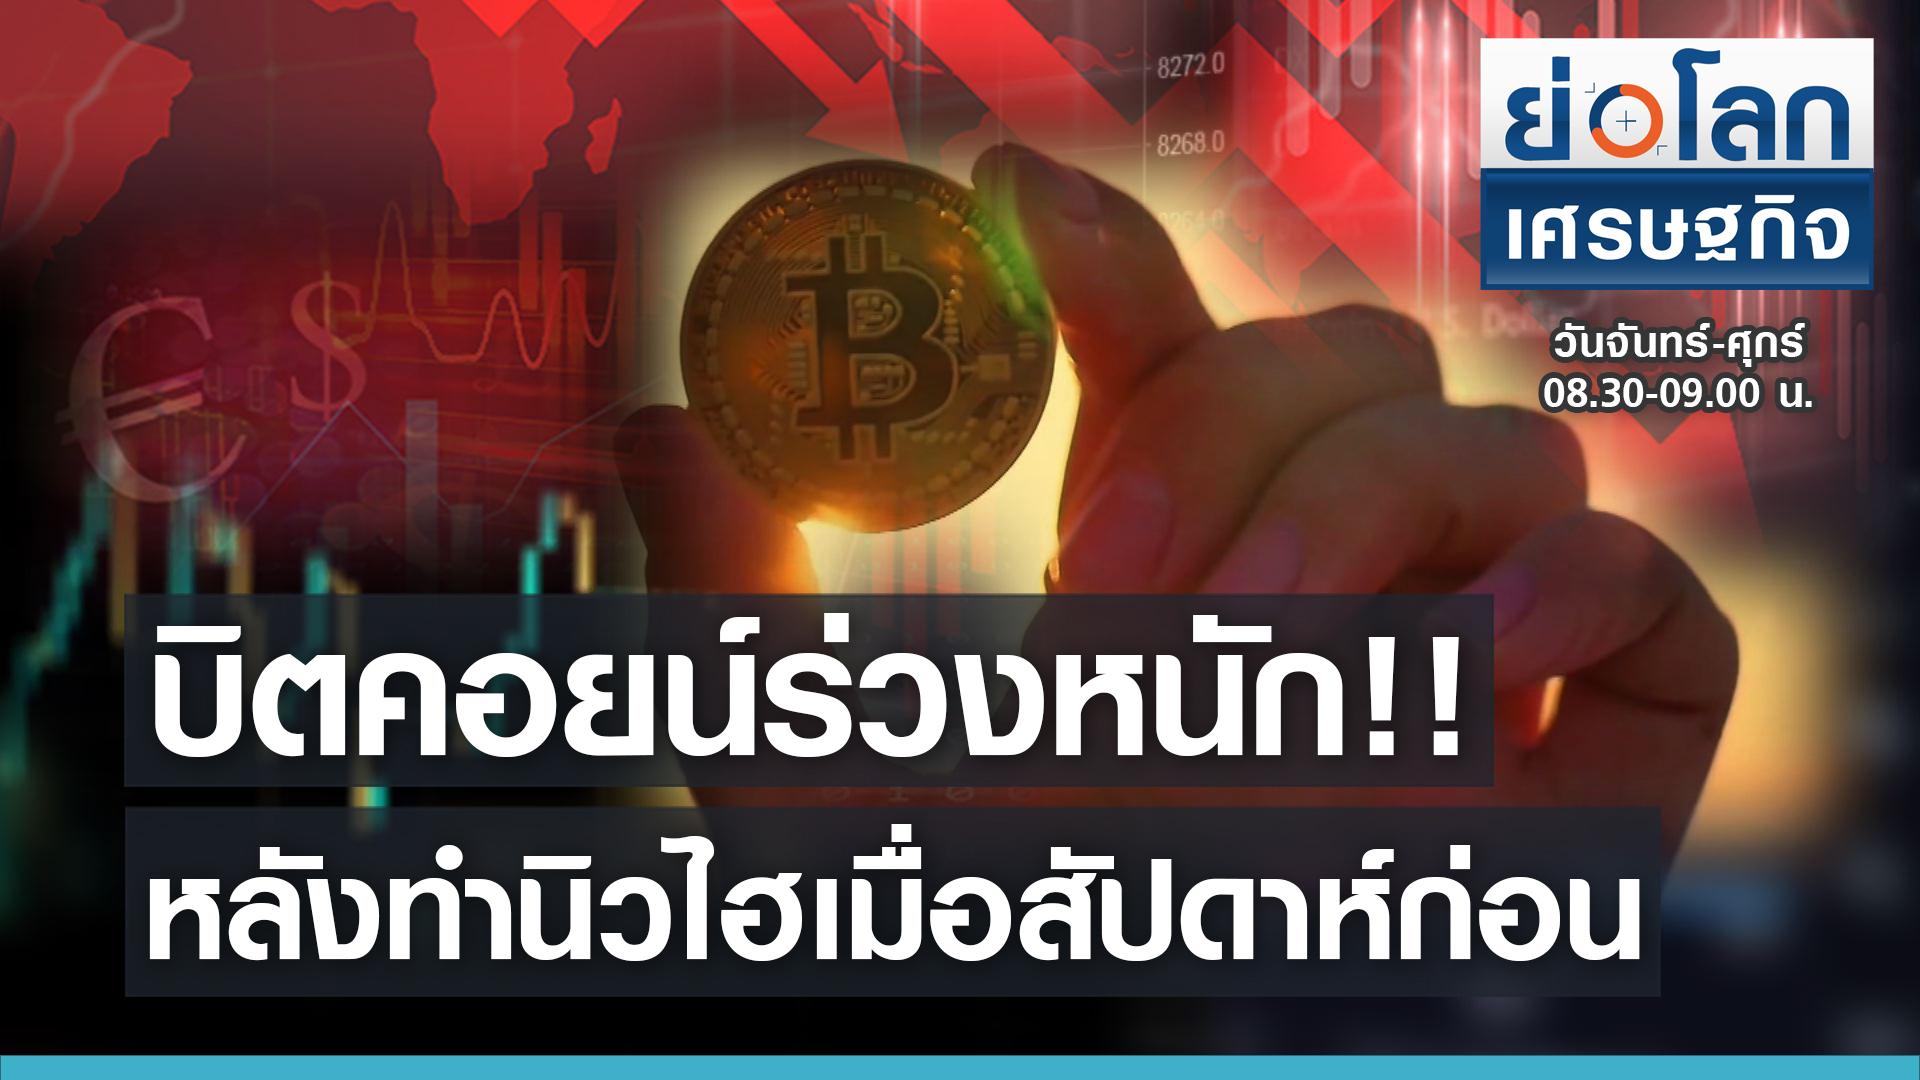 Bitcoin ร่วงหนัก หลังทำนิวไฮเมื่อสัปดาห์ก่อน